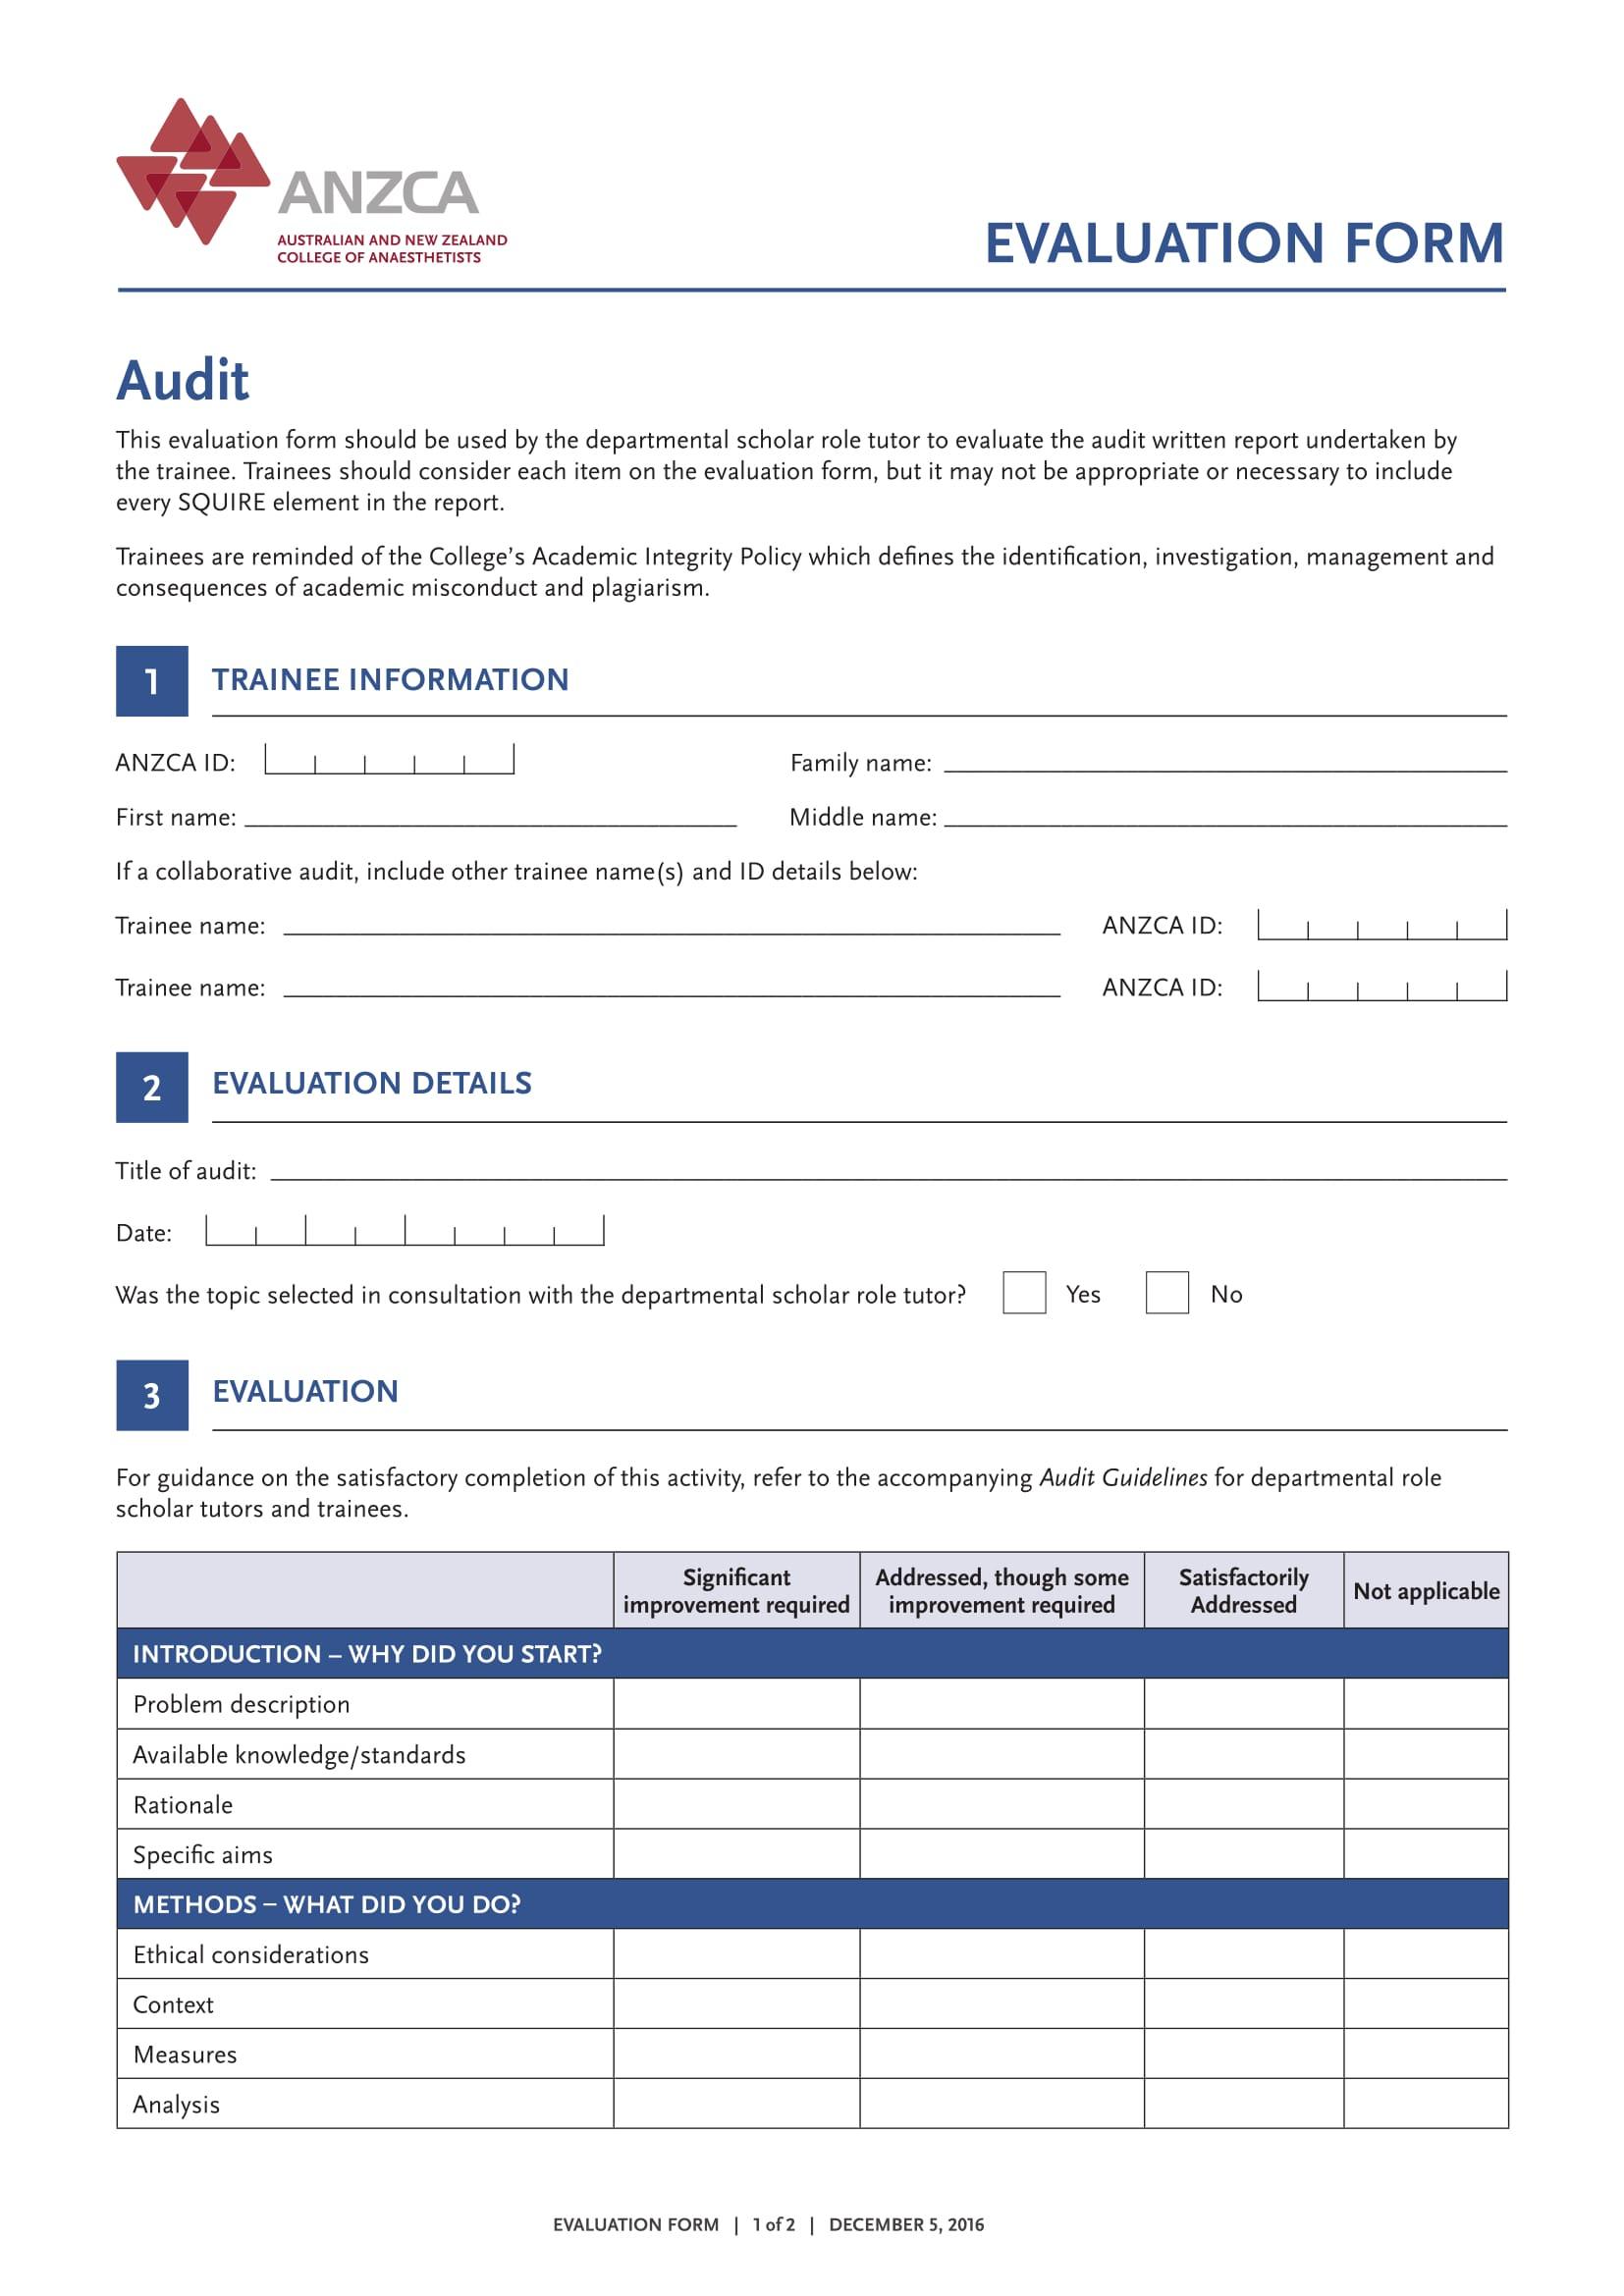 audit trainee evaluation form 1